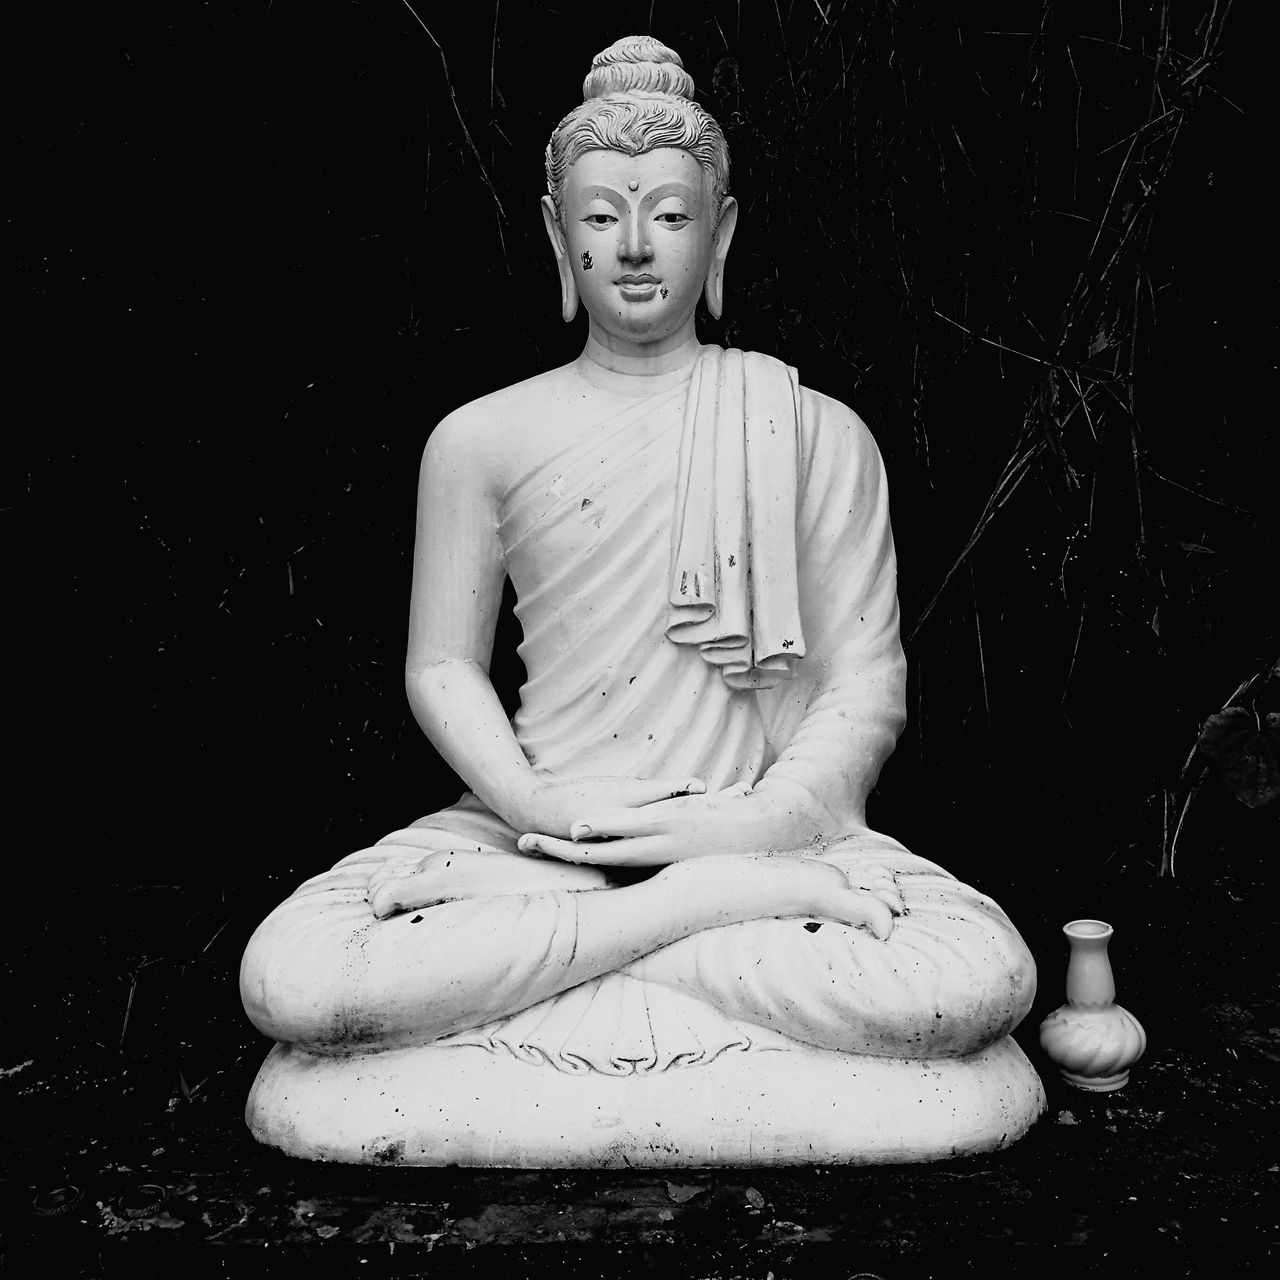 Human Representation Religion Material Statue Night Outdoors No Peoplebl Buddhist Monks Buddha Temple Buddist Temple Buddism Buddah Buddha Image Buda Ancient Beauty Ancient Remains Ancientart